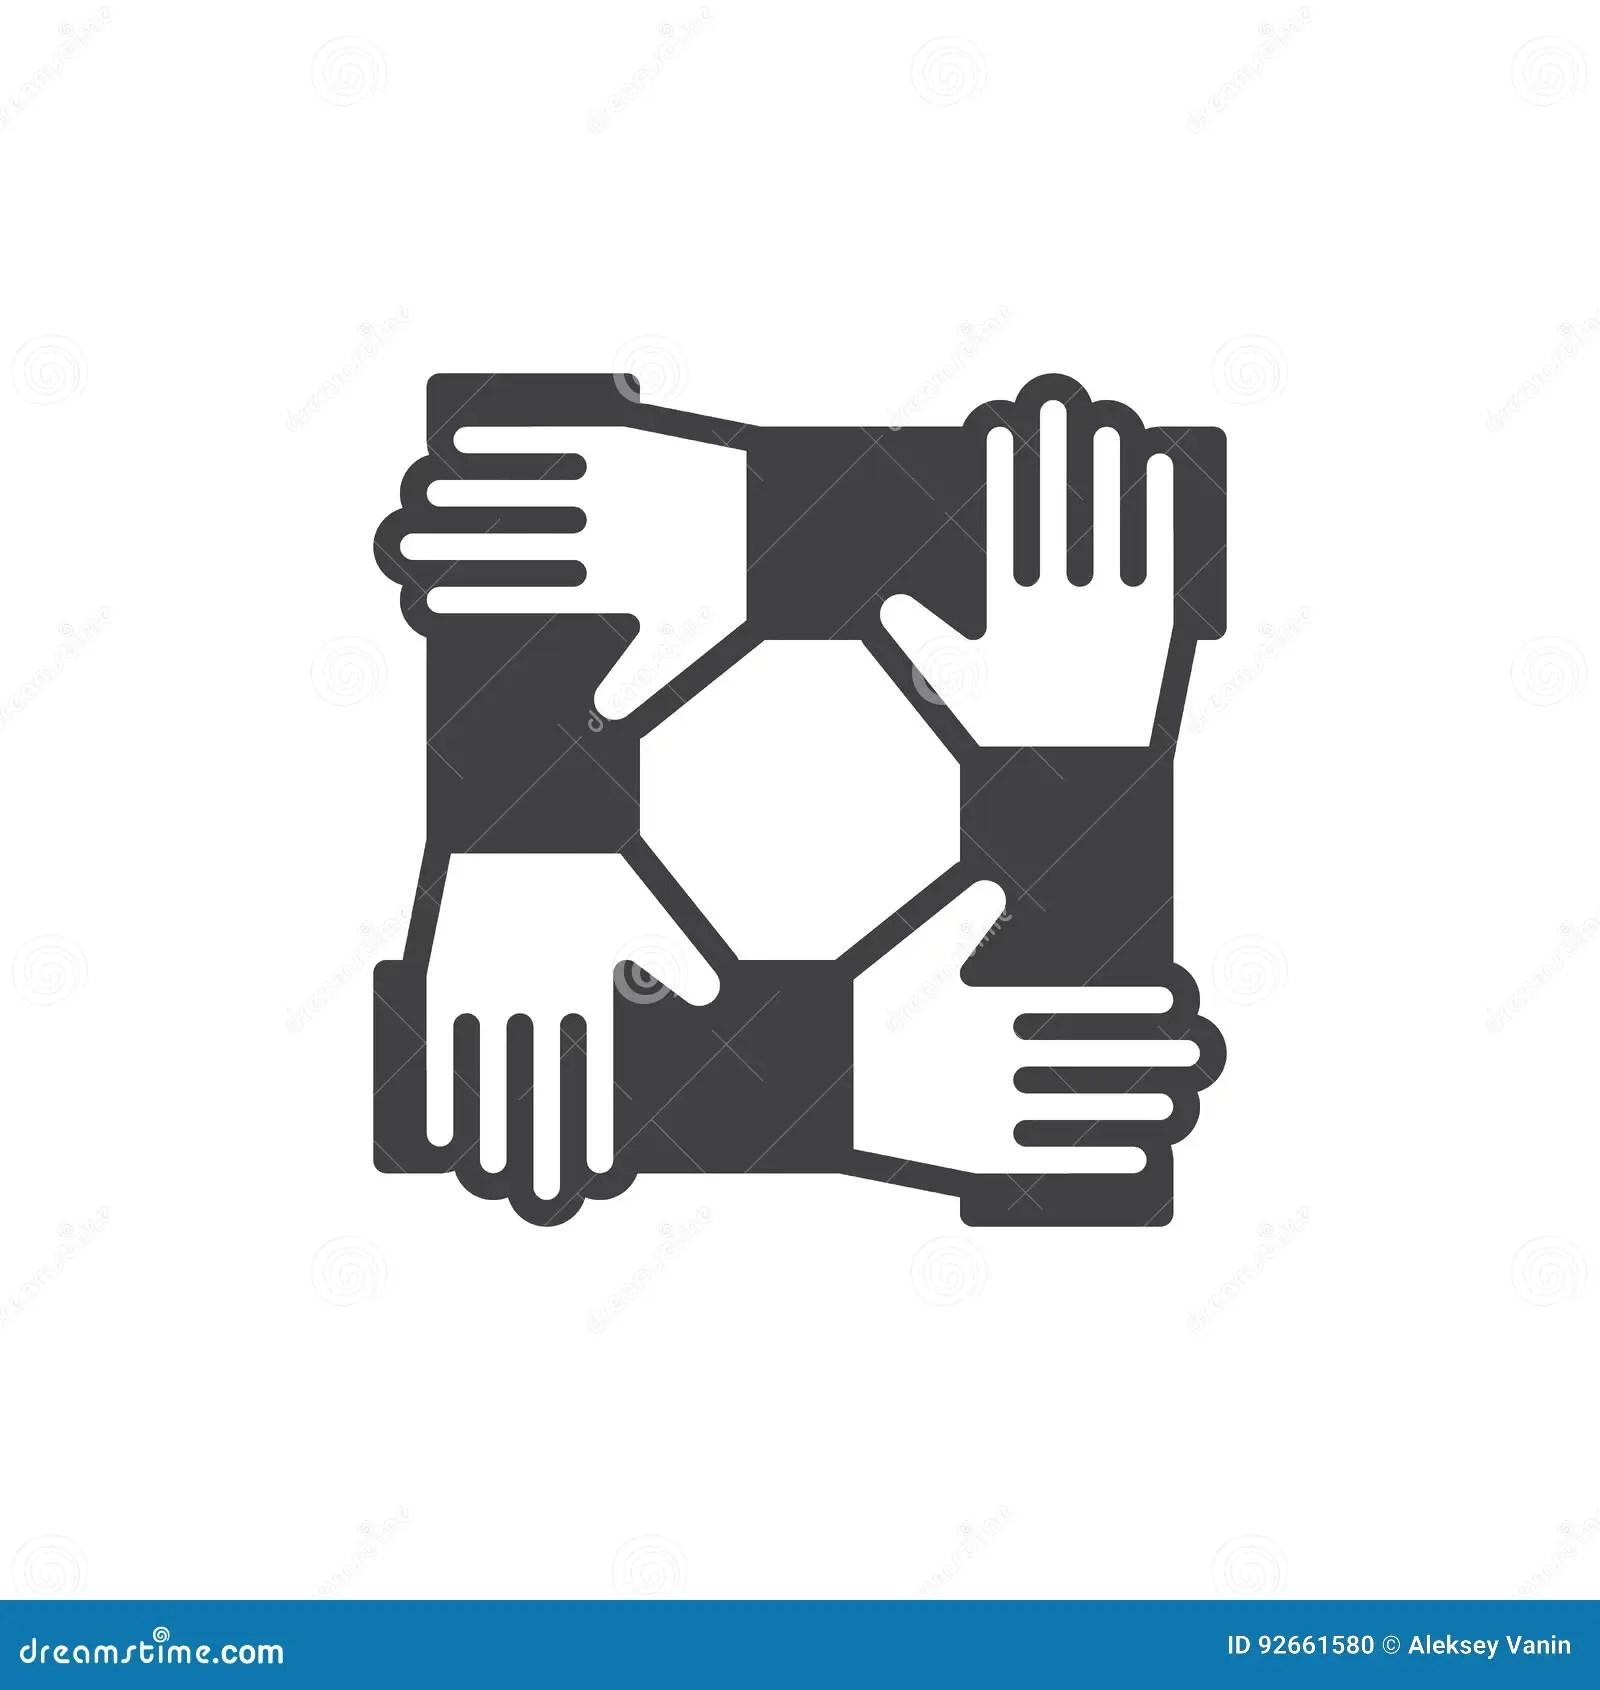 Teamwork Hands Logo Vector Illustration